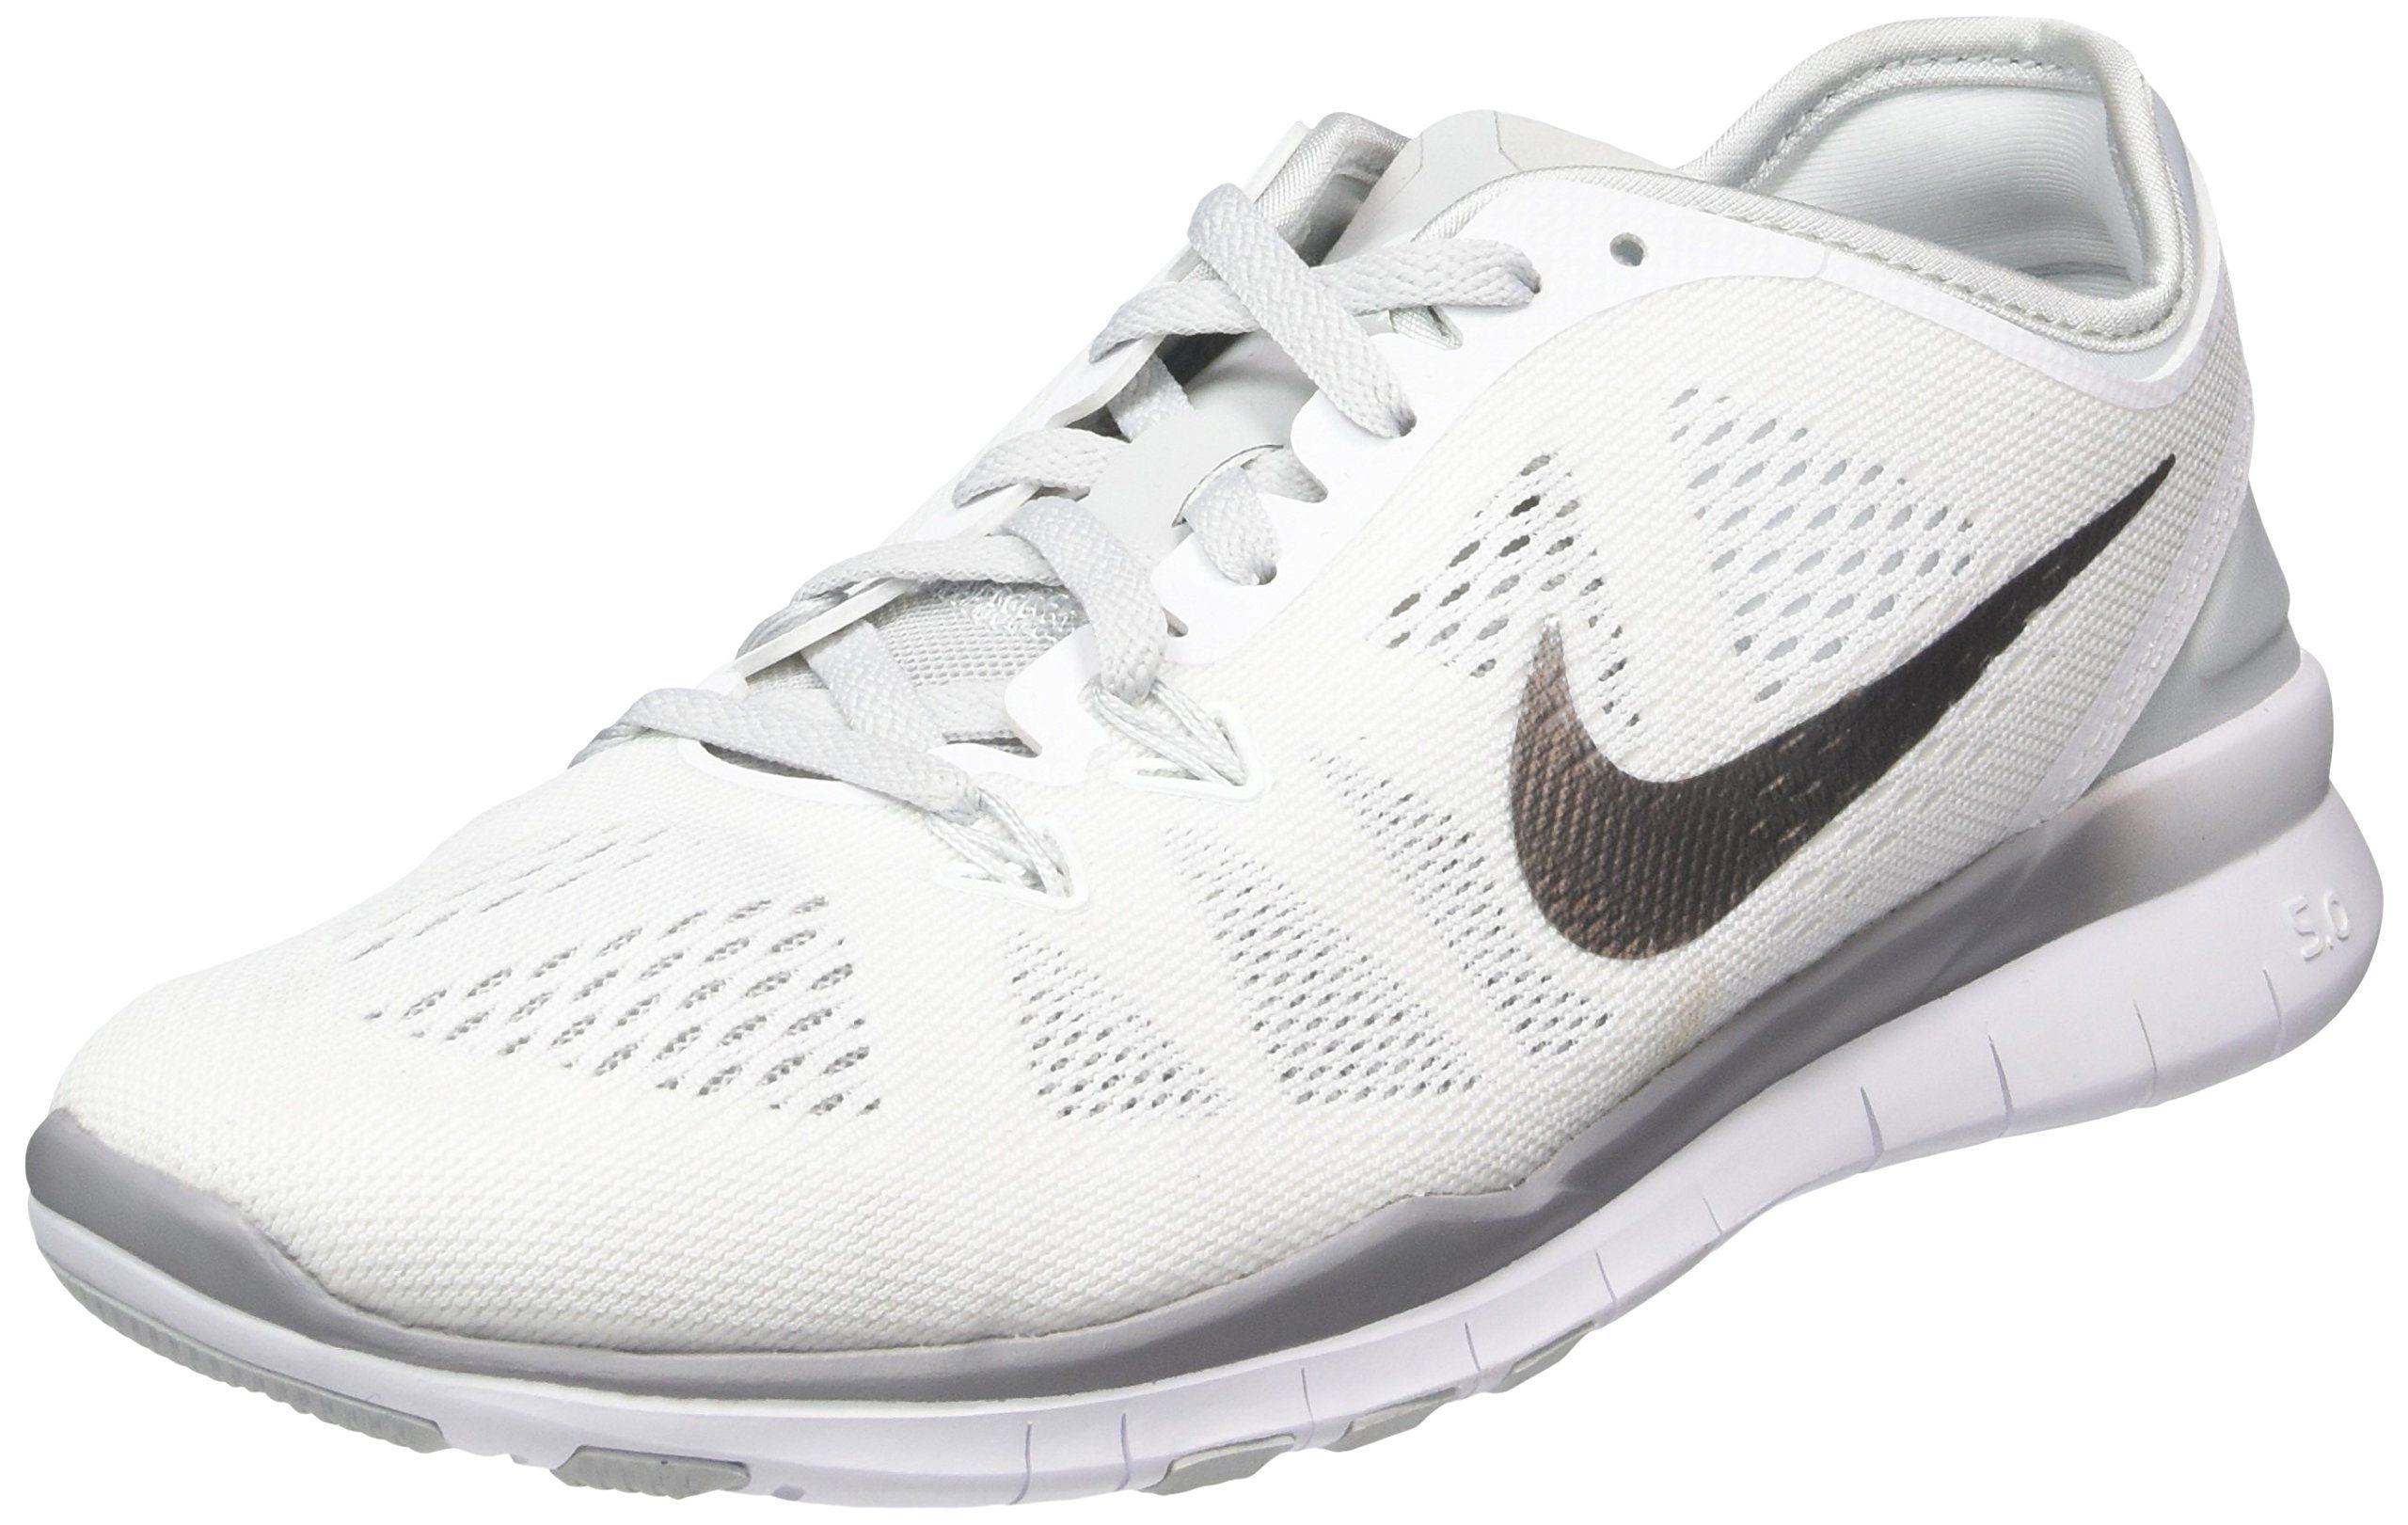 Nike Free 5.0 TR Fit 5 Womens Cross Training Shoes 11 WHITE